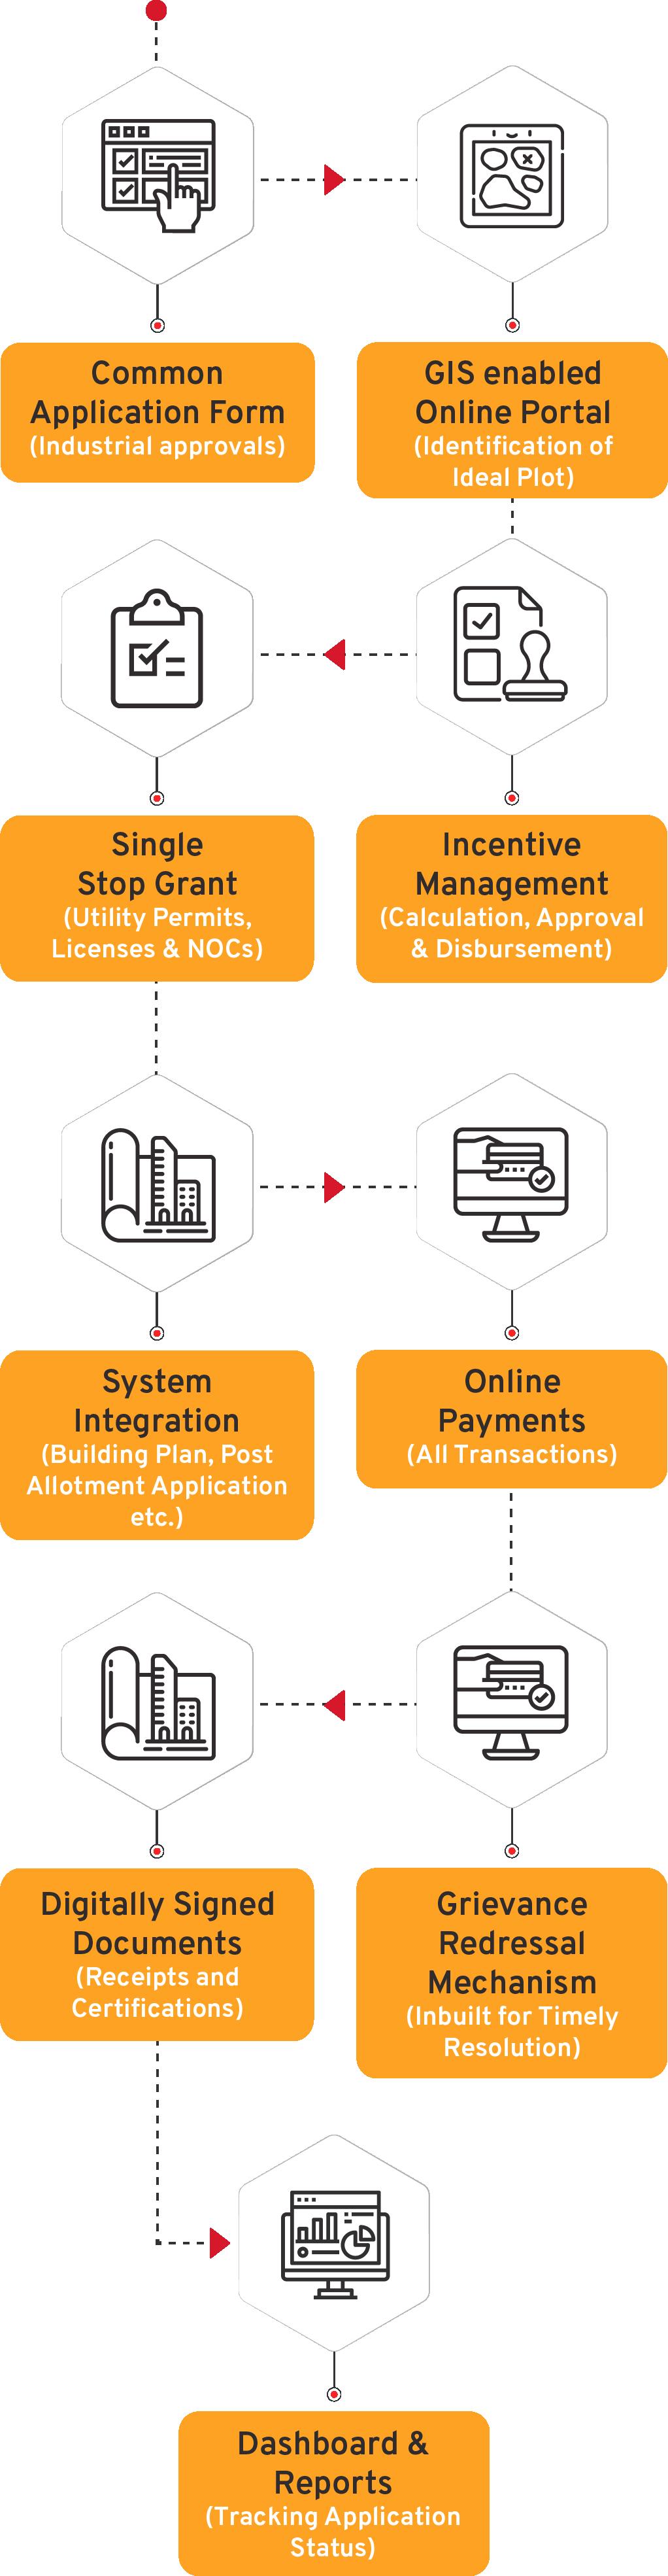 Single Window System Flow Diagrams - CSM Technologies